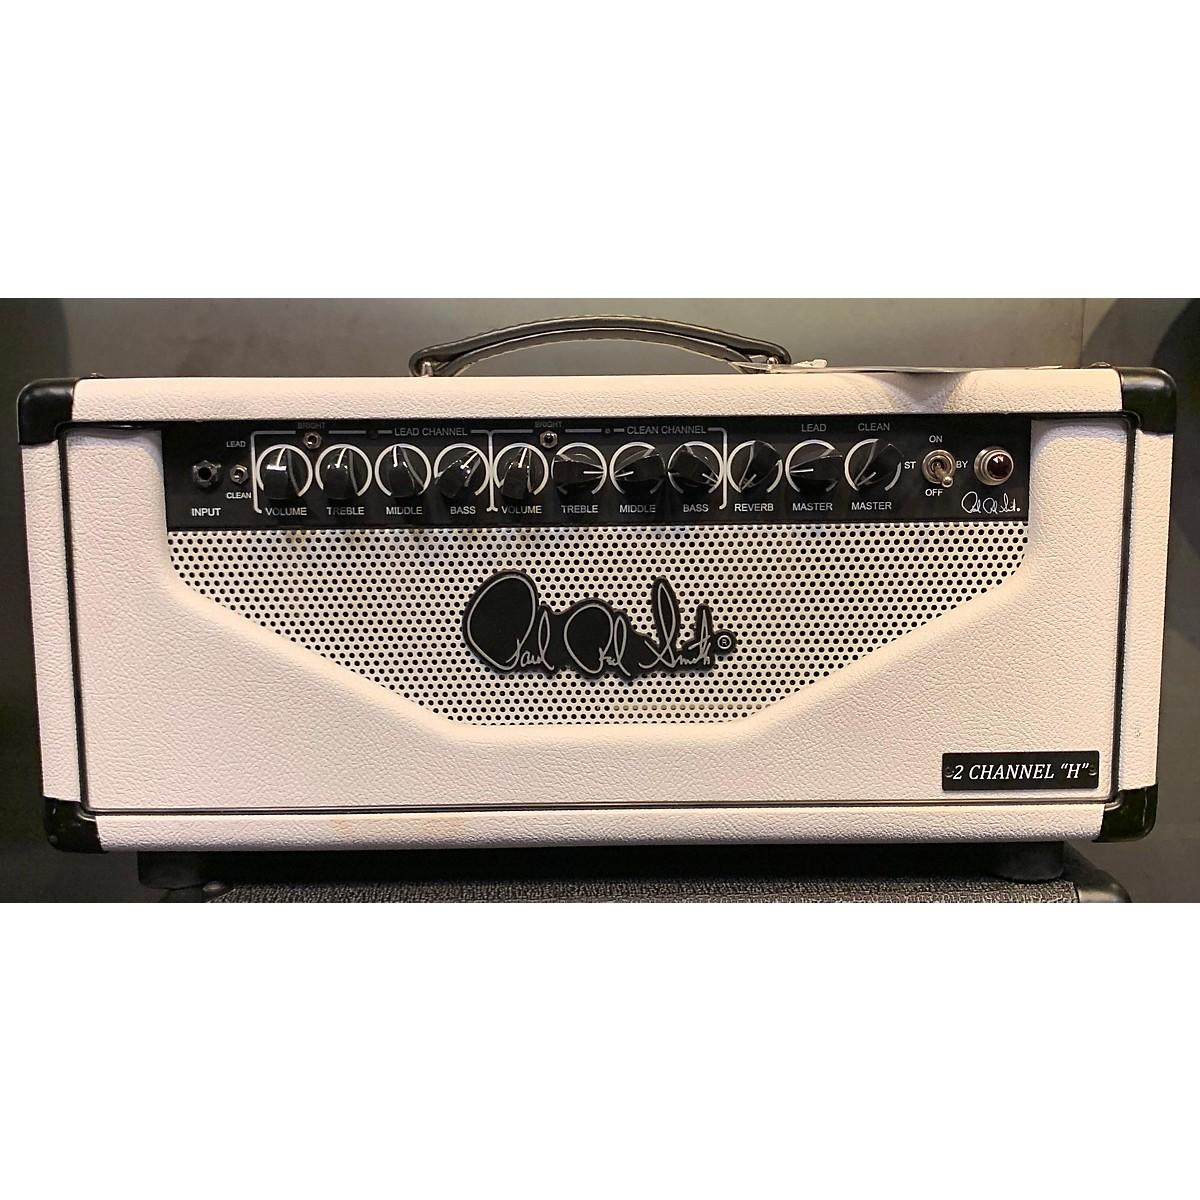 PRS 2012 2 Channel H White Tube Guitar Amp Head